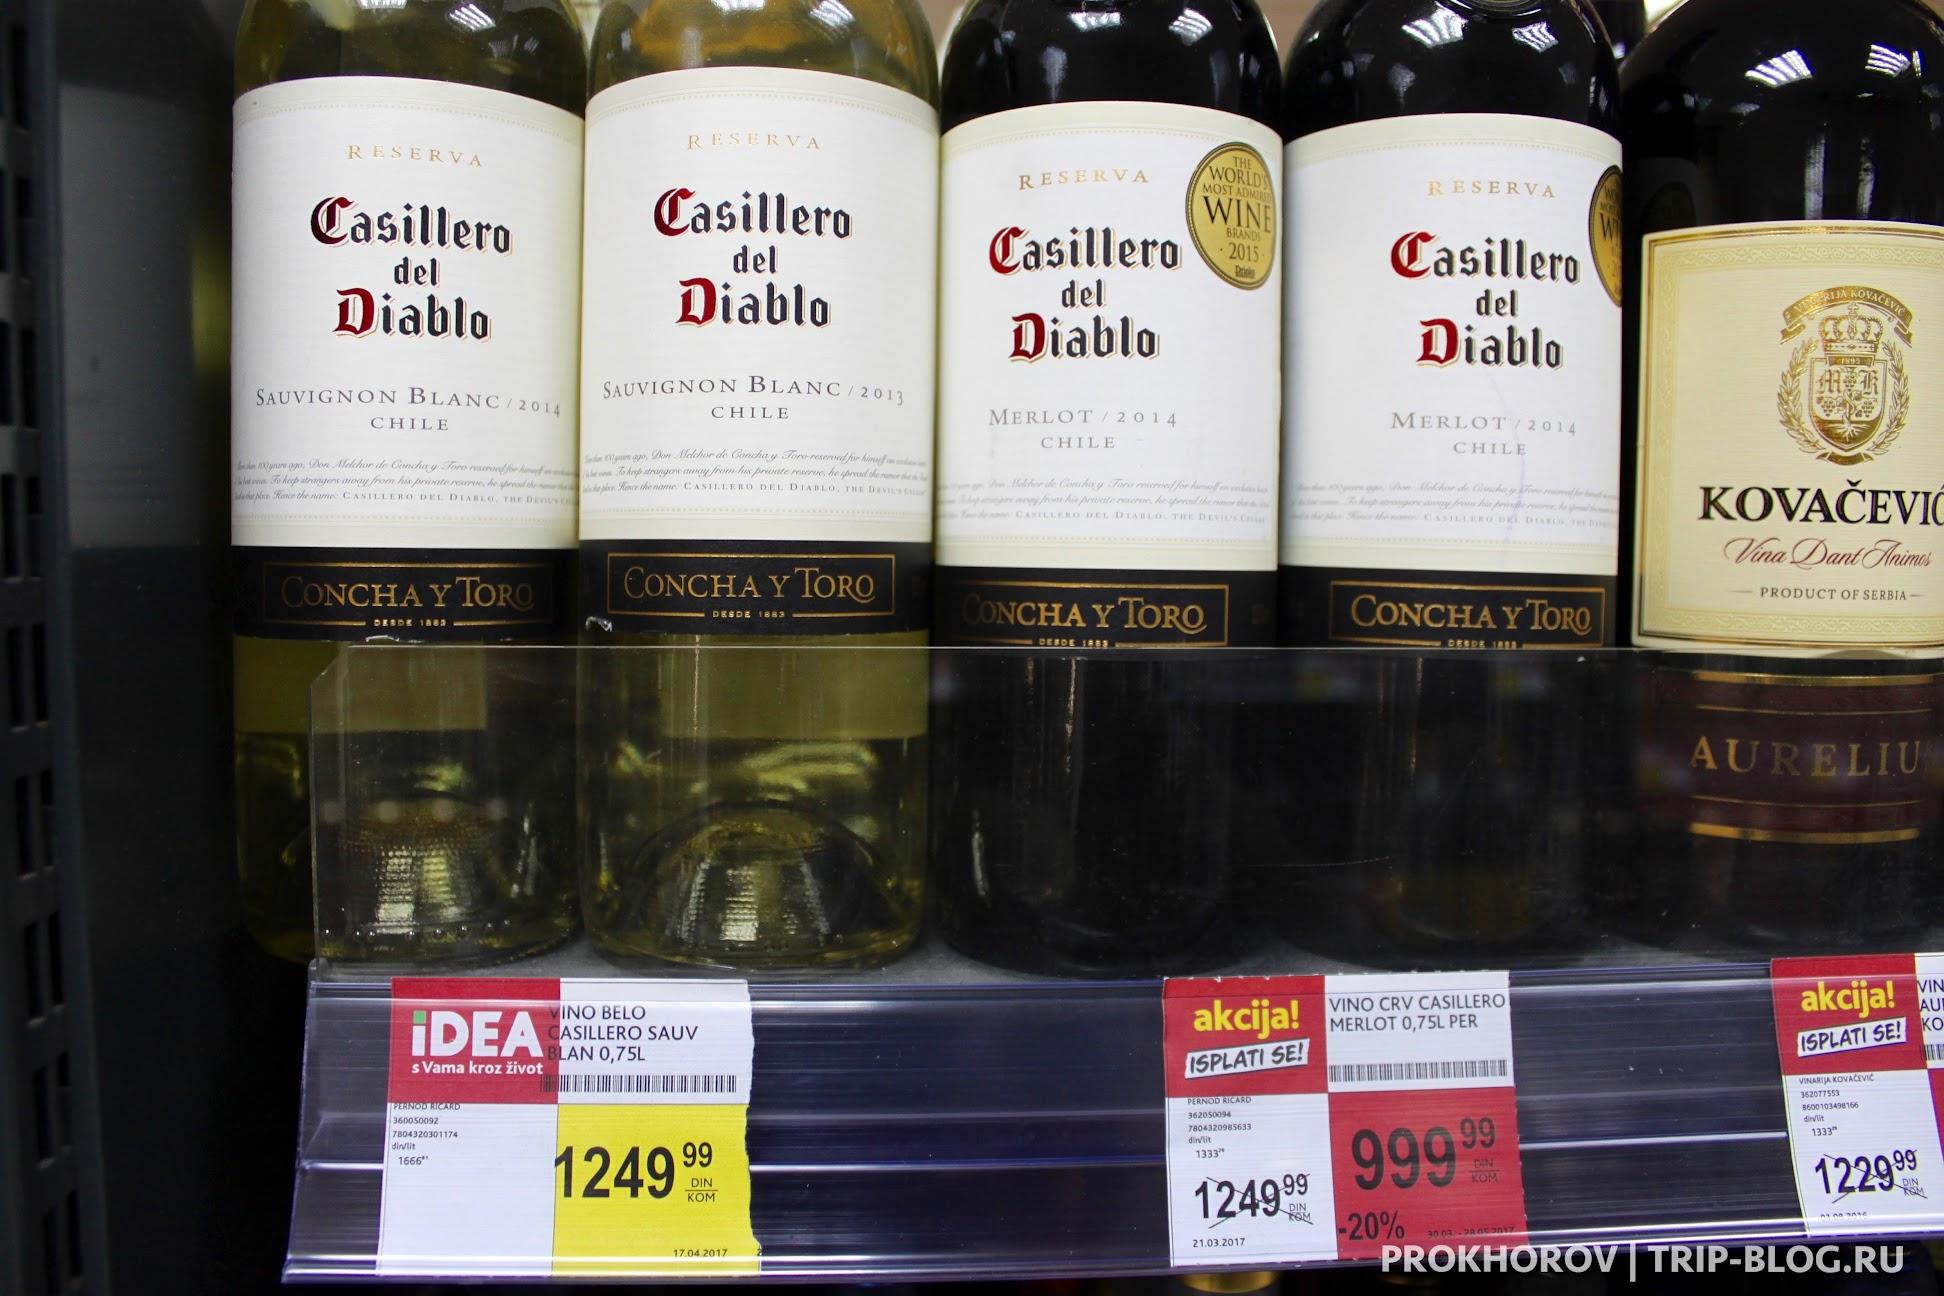 Чилийское вино Casillero del diablo